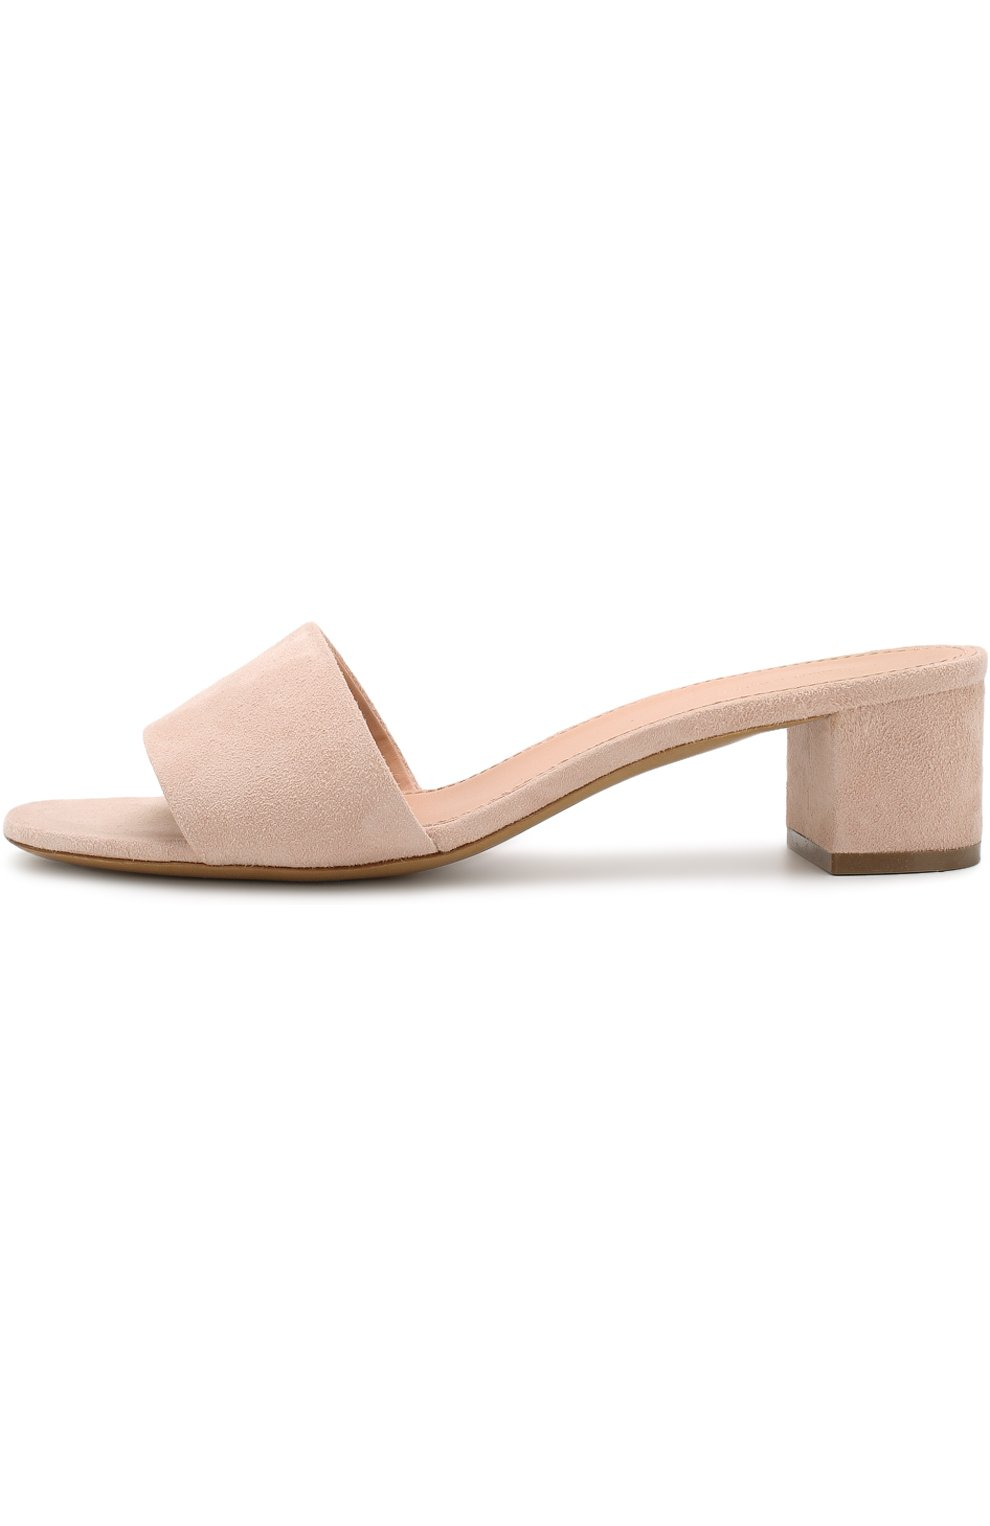 Замшевые сабо на устойчивом каблуке Mansur Gavriel светло-розовые   Фото №3